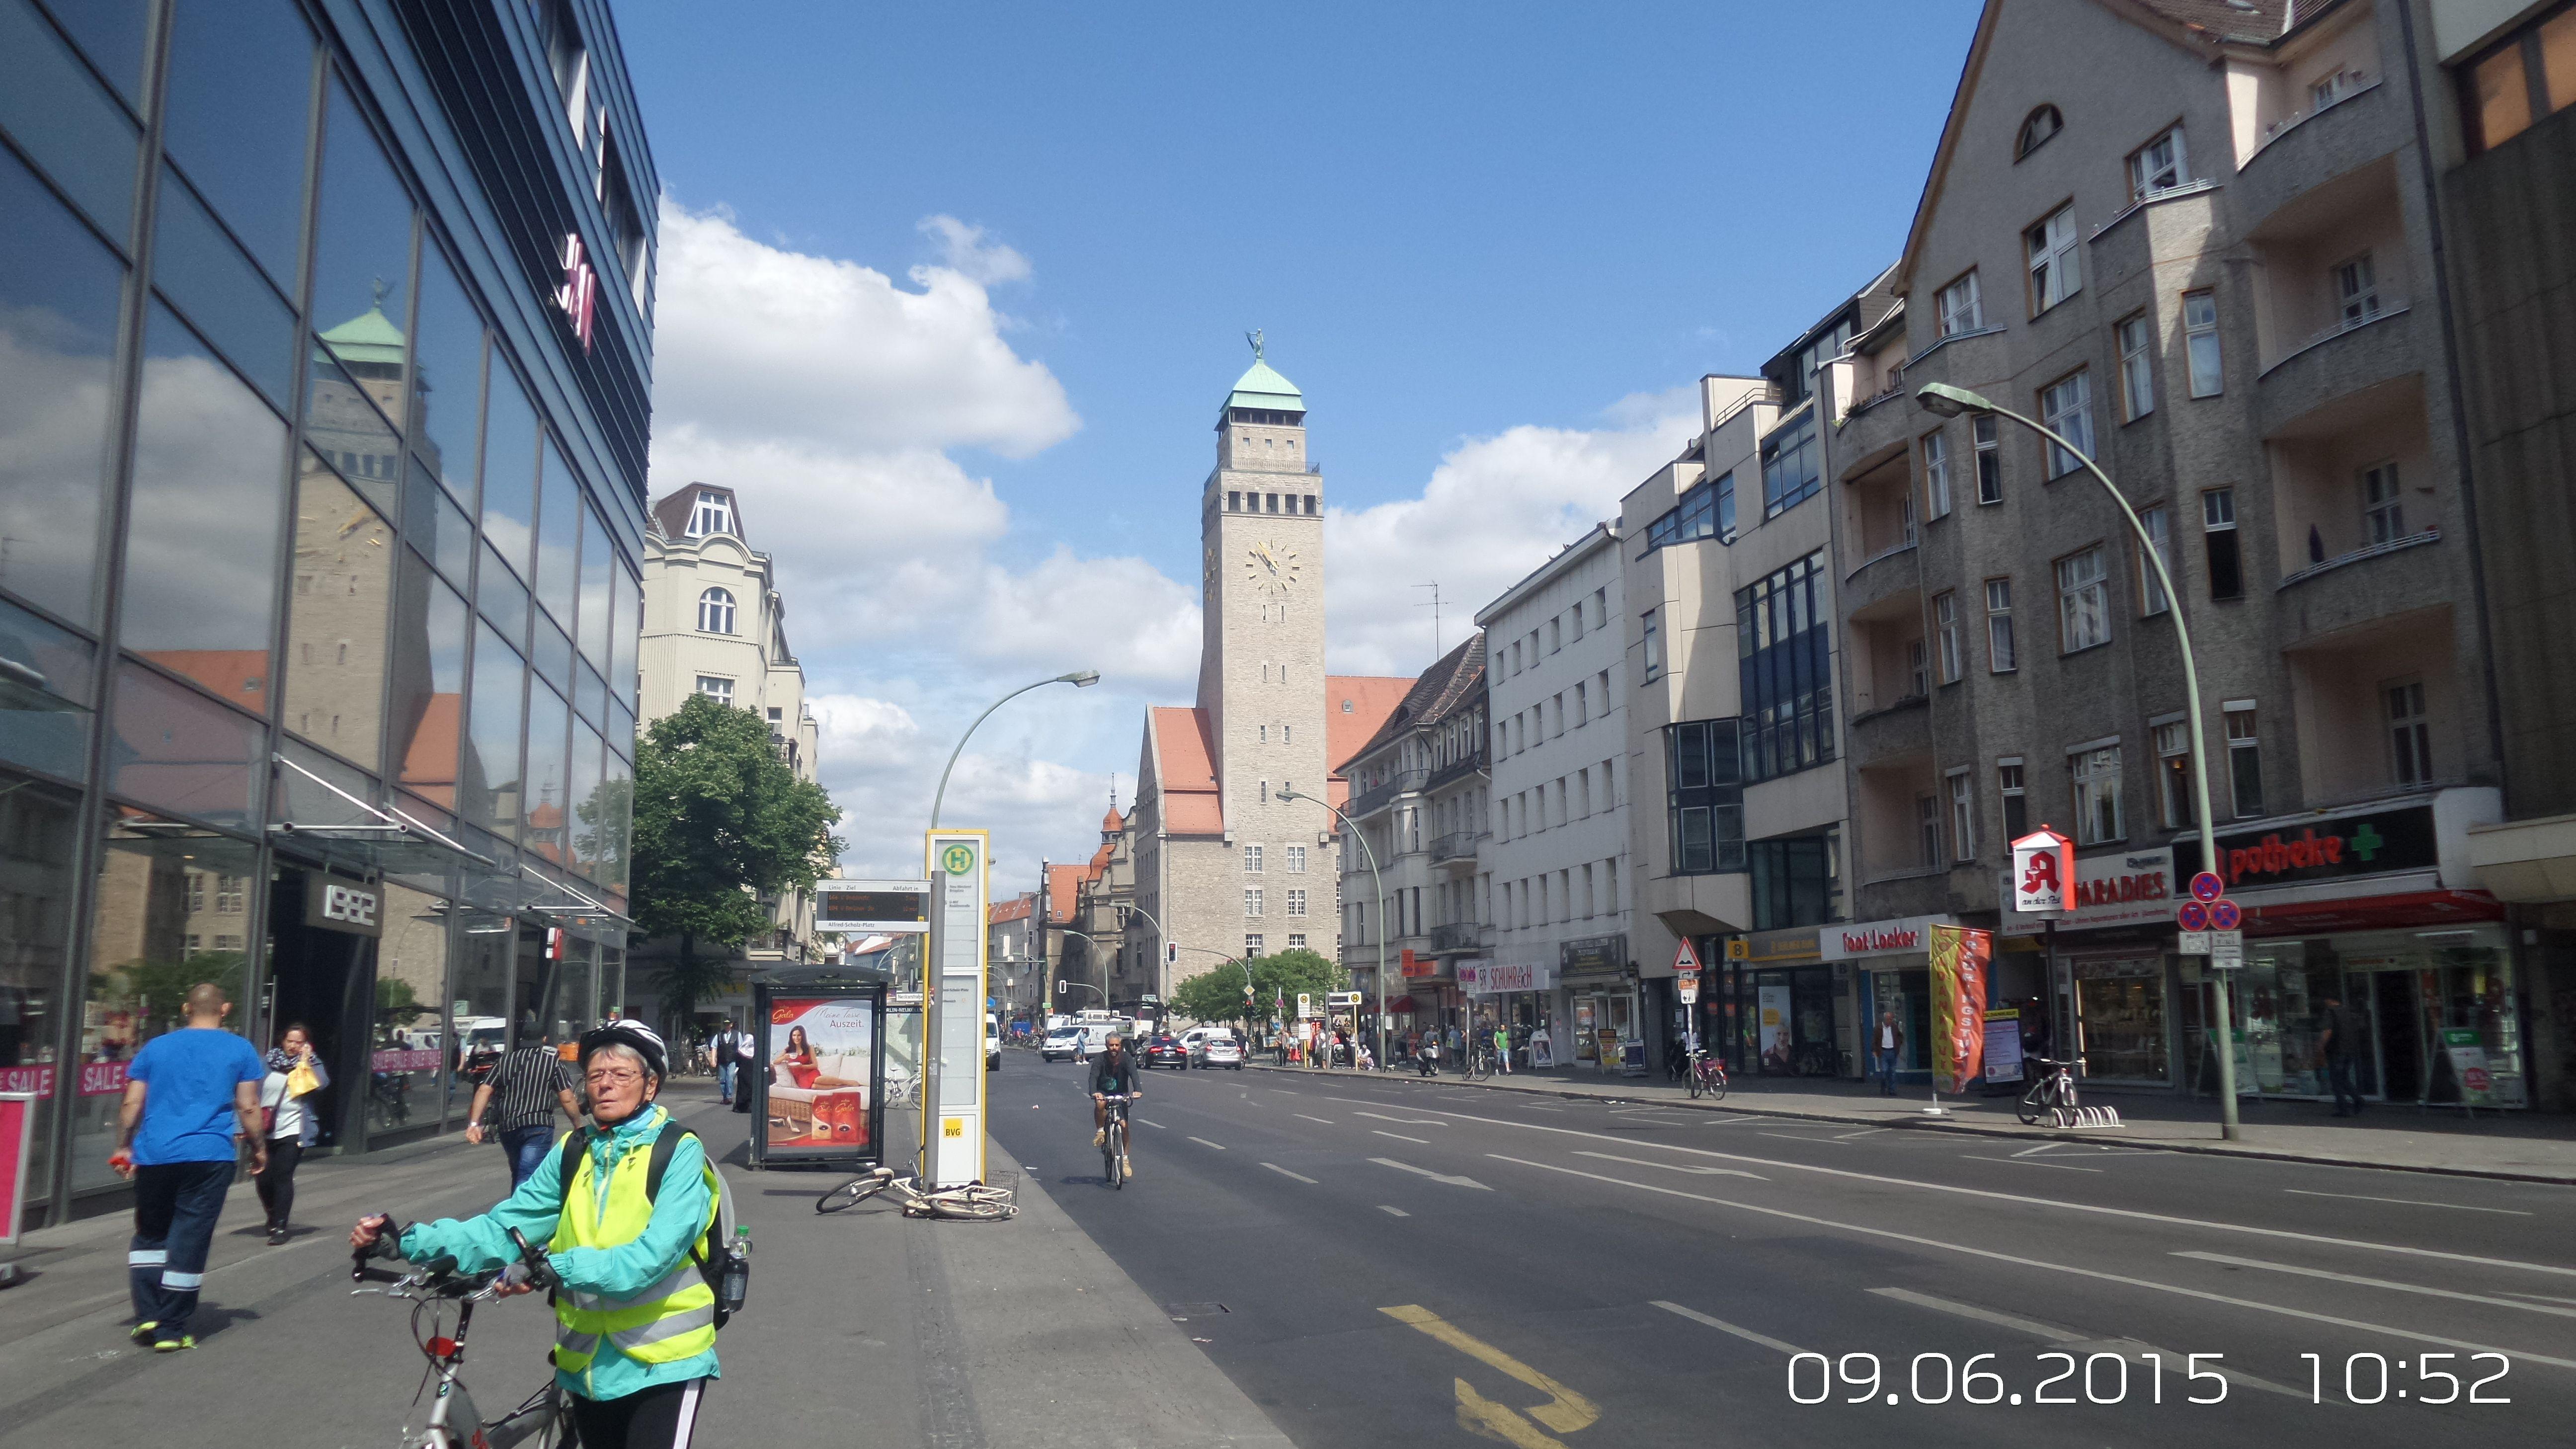 Neukölln, Karl Marx Str. mit Rathaus | Rathaus, Hauptstadt